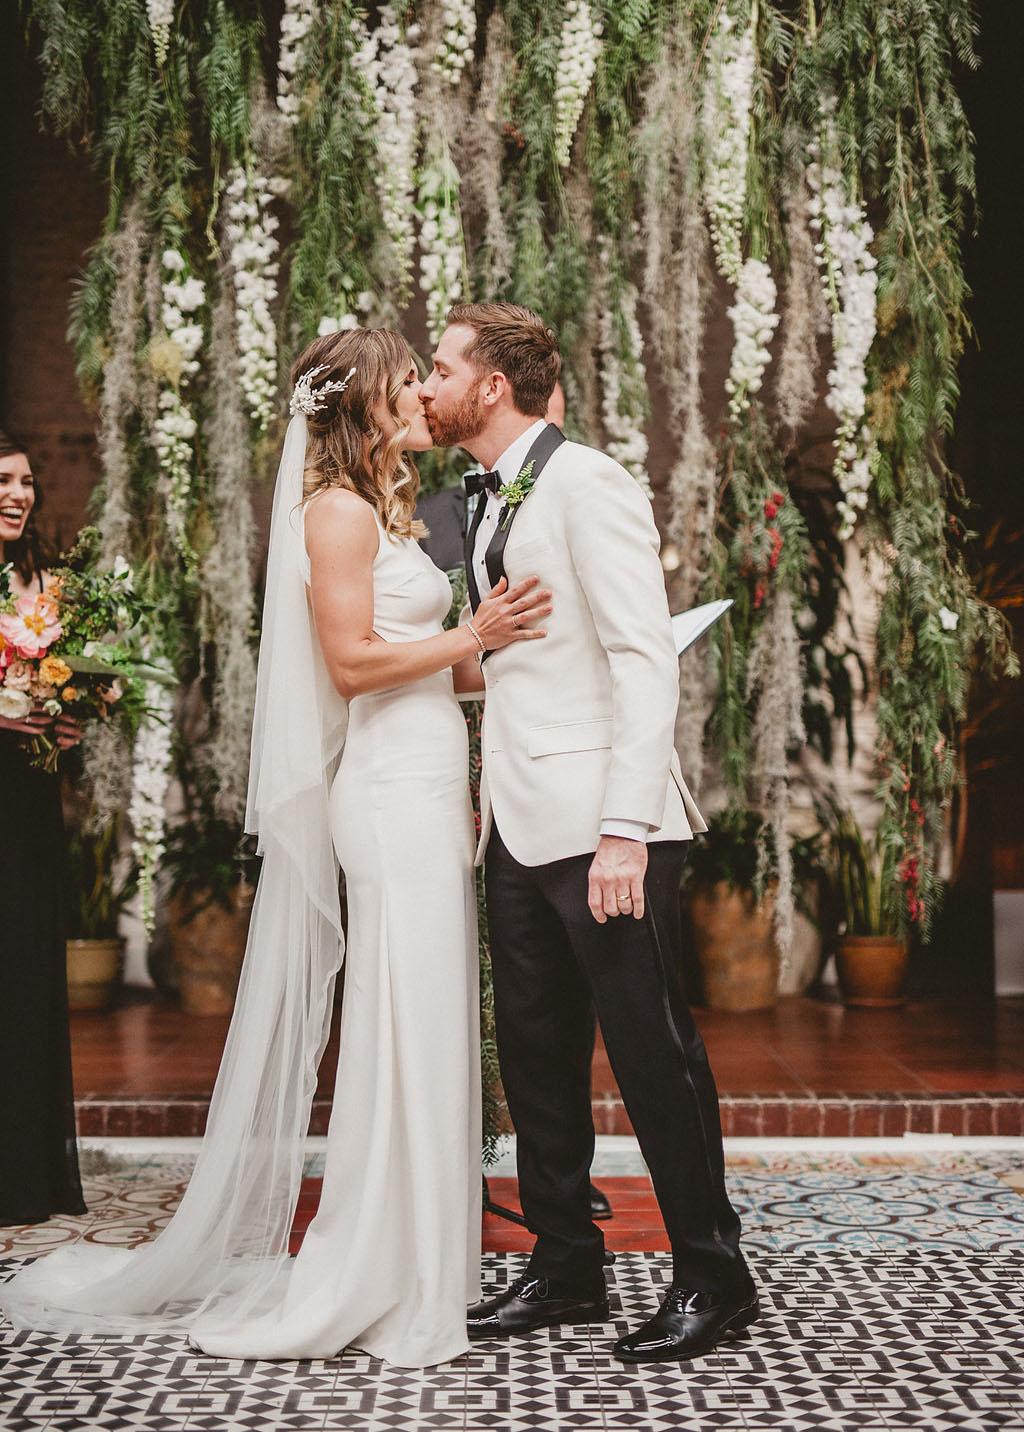 Modern Romantic Ebell Wedding